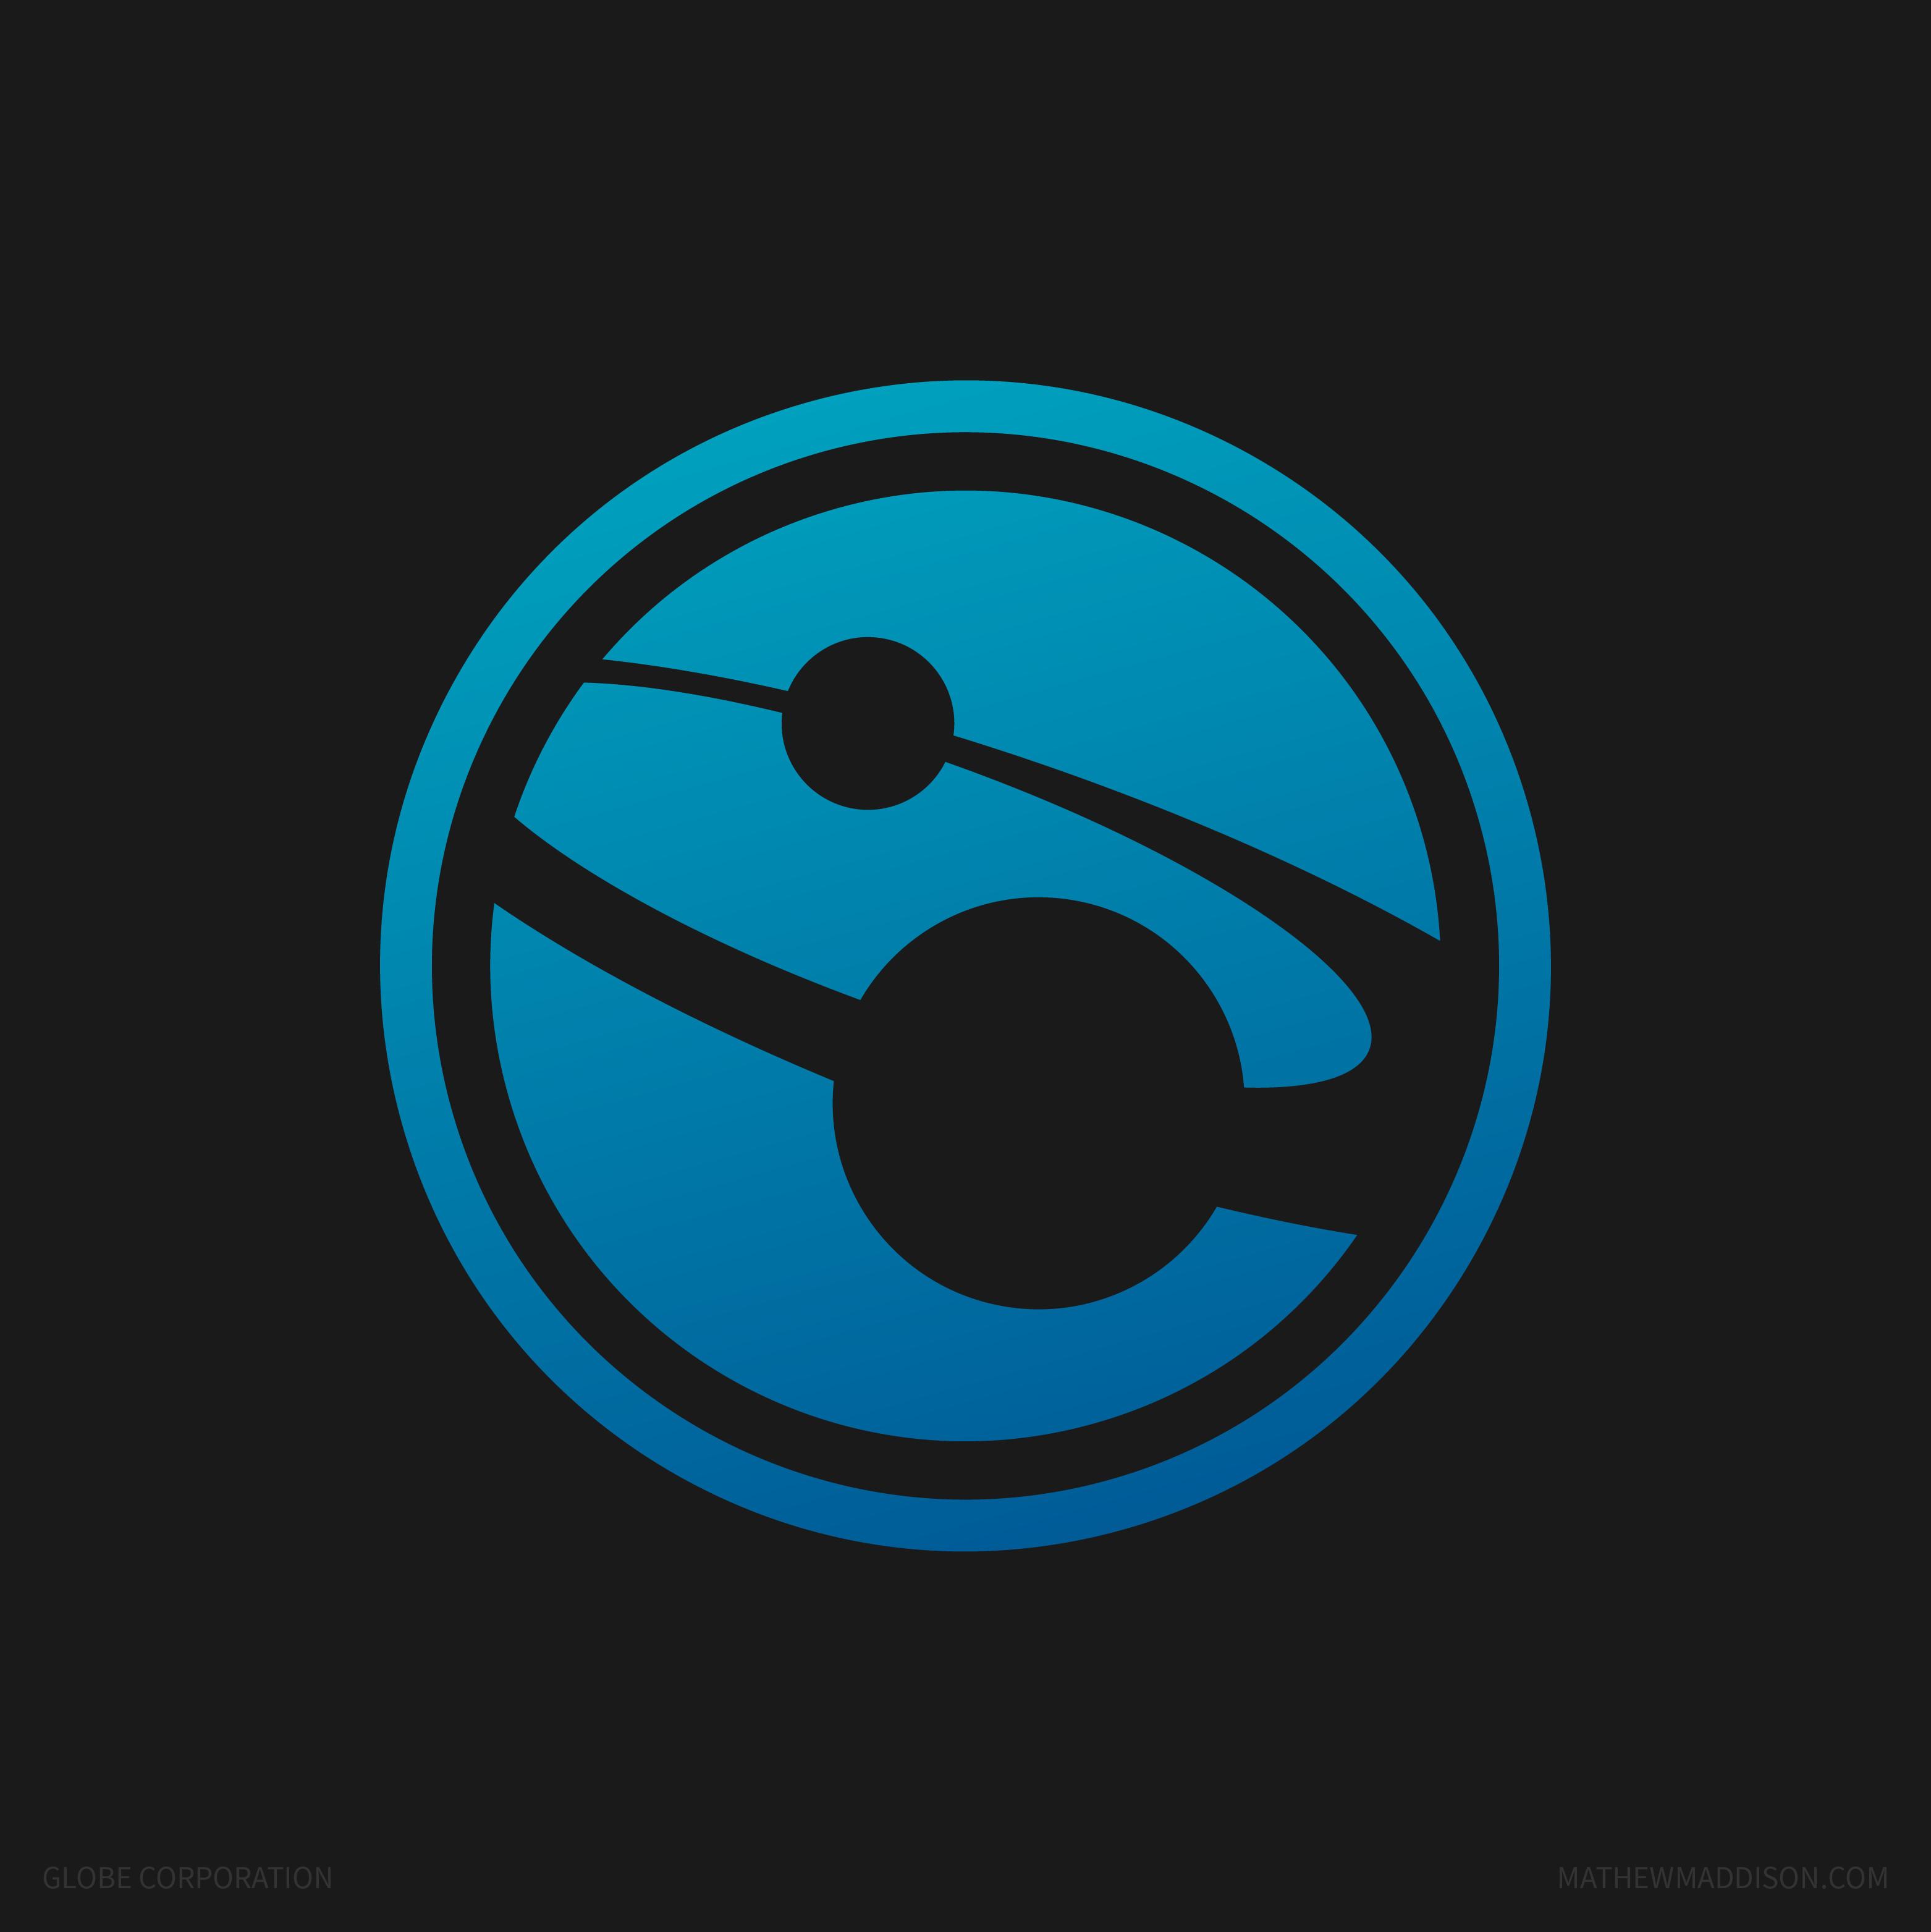 The Globe Corporation